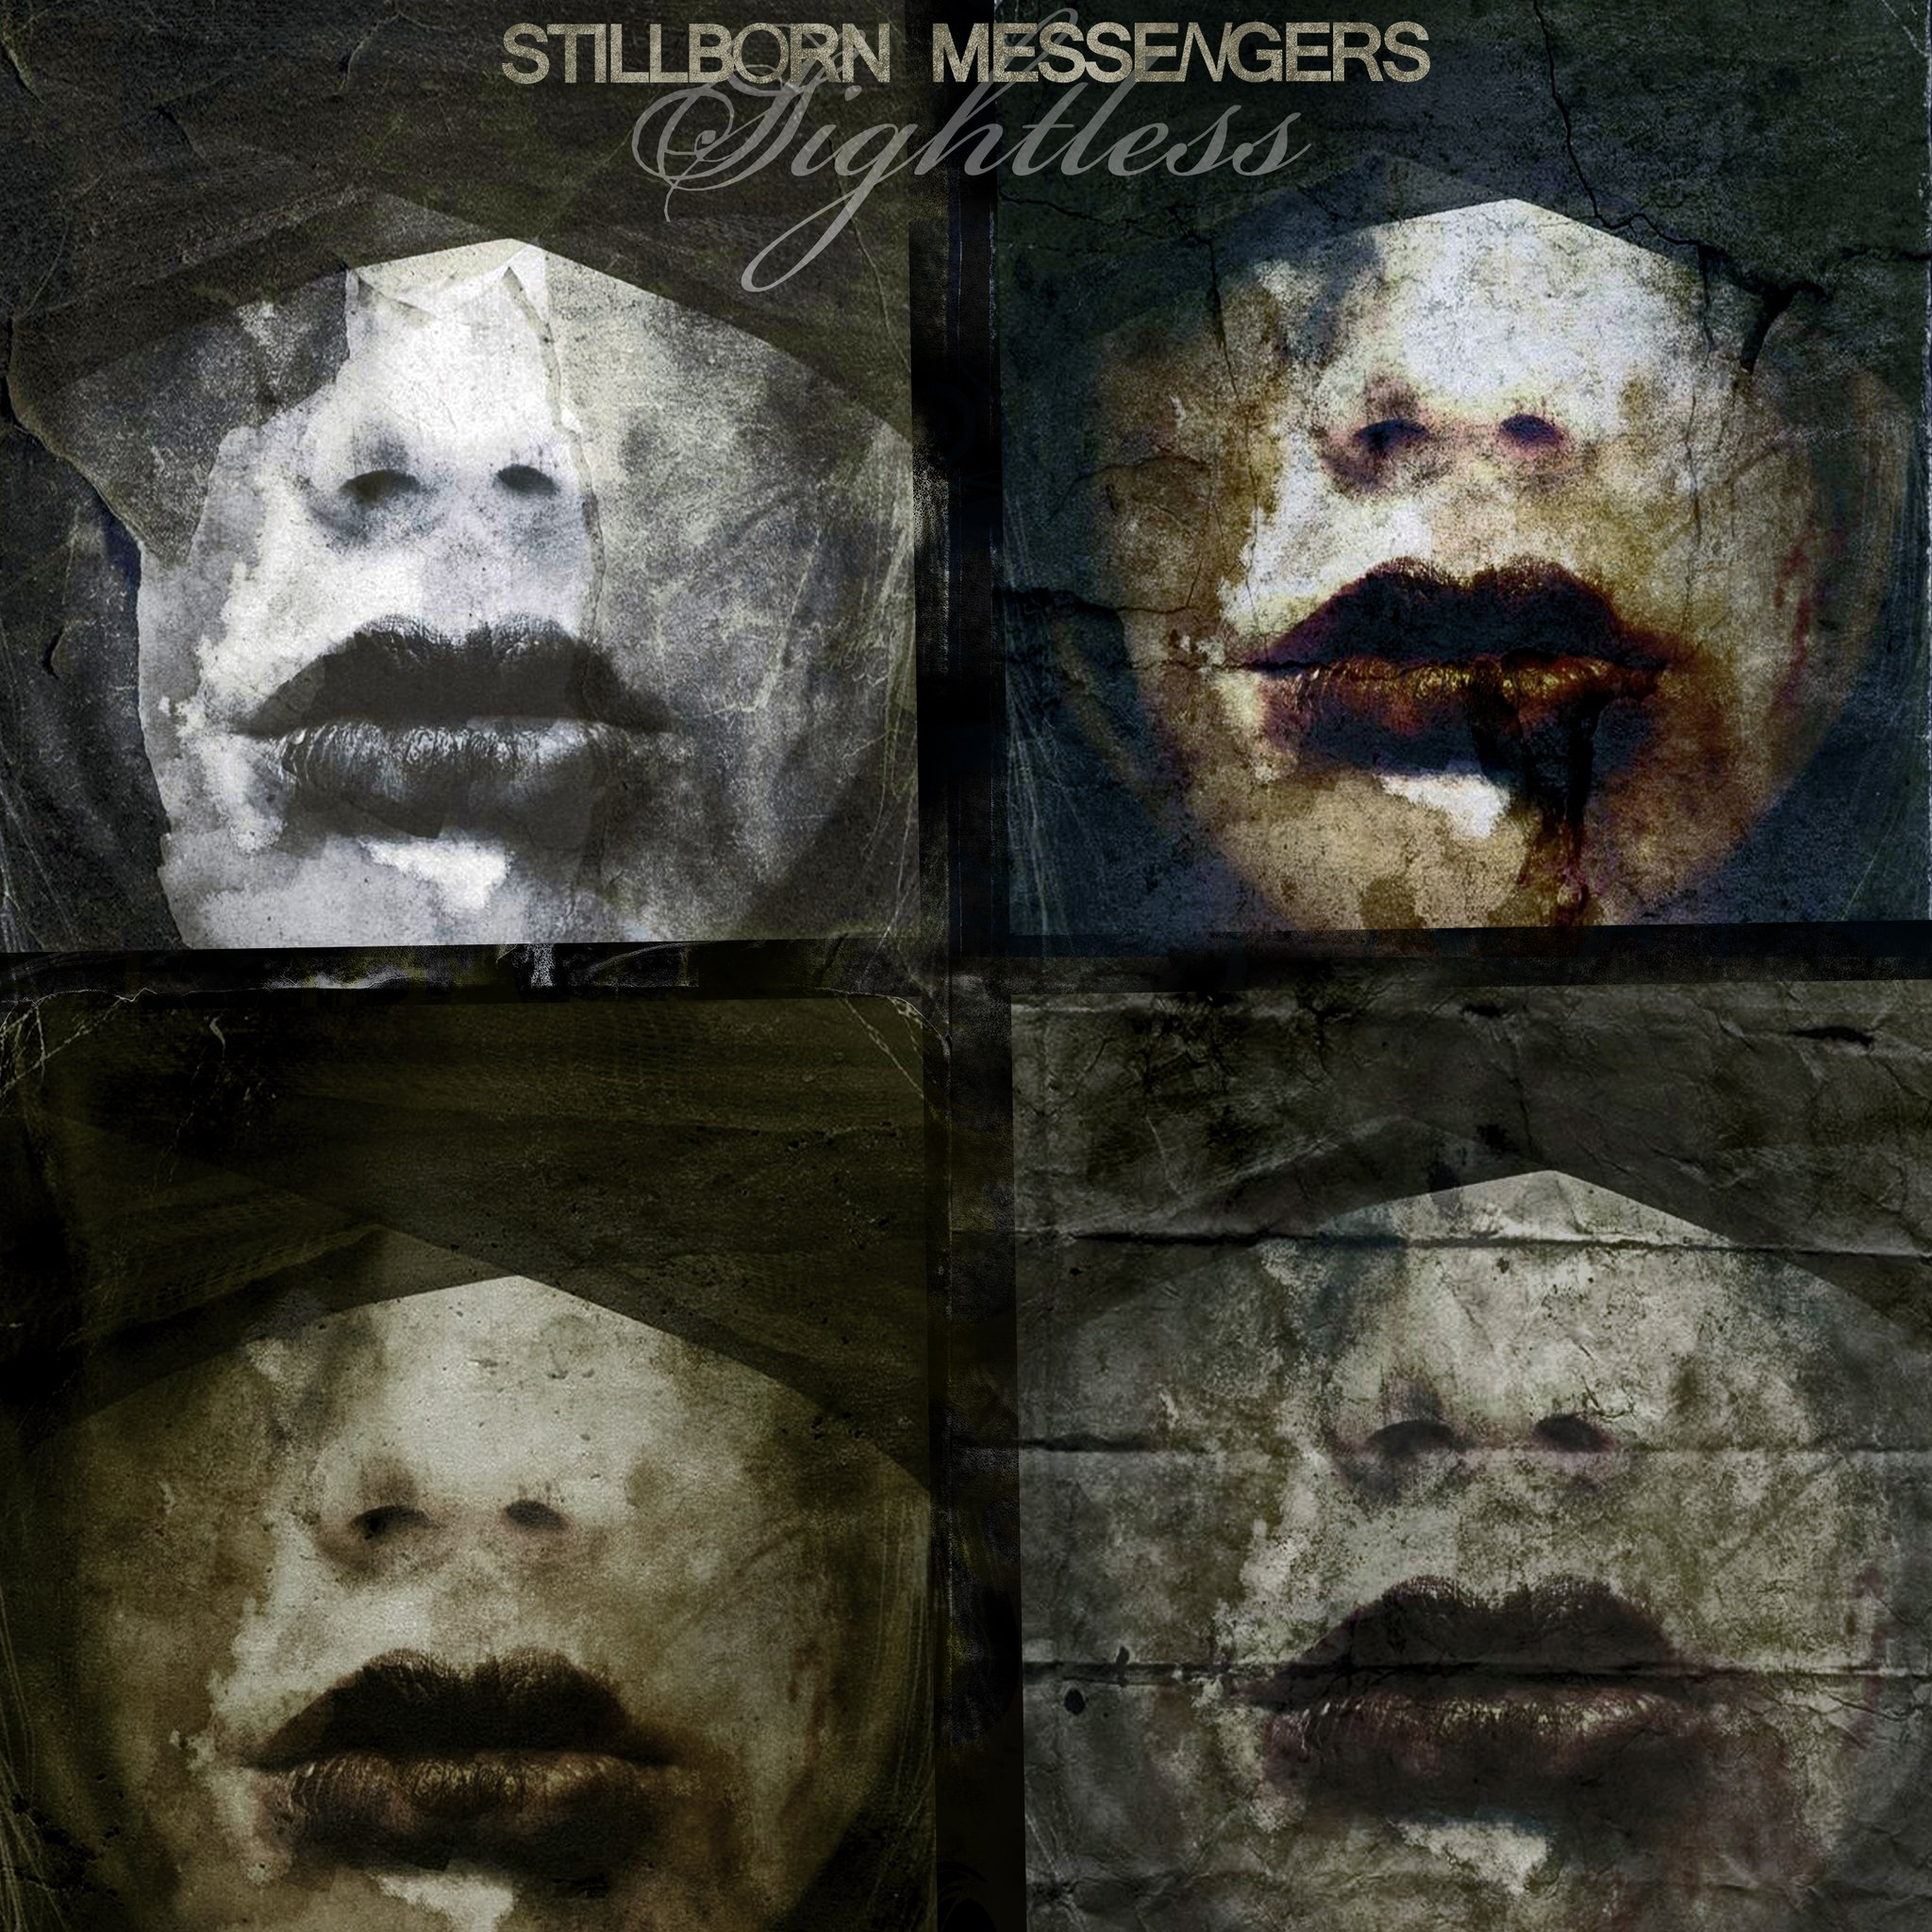 Stillborn Messengers - Sightless [EP] (2012)